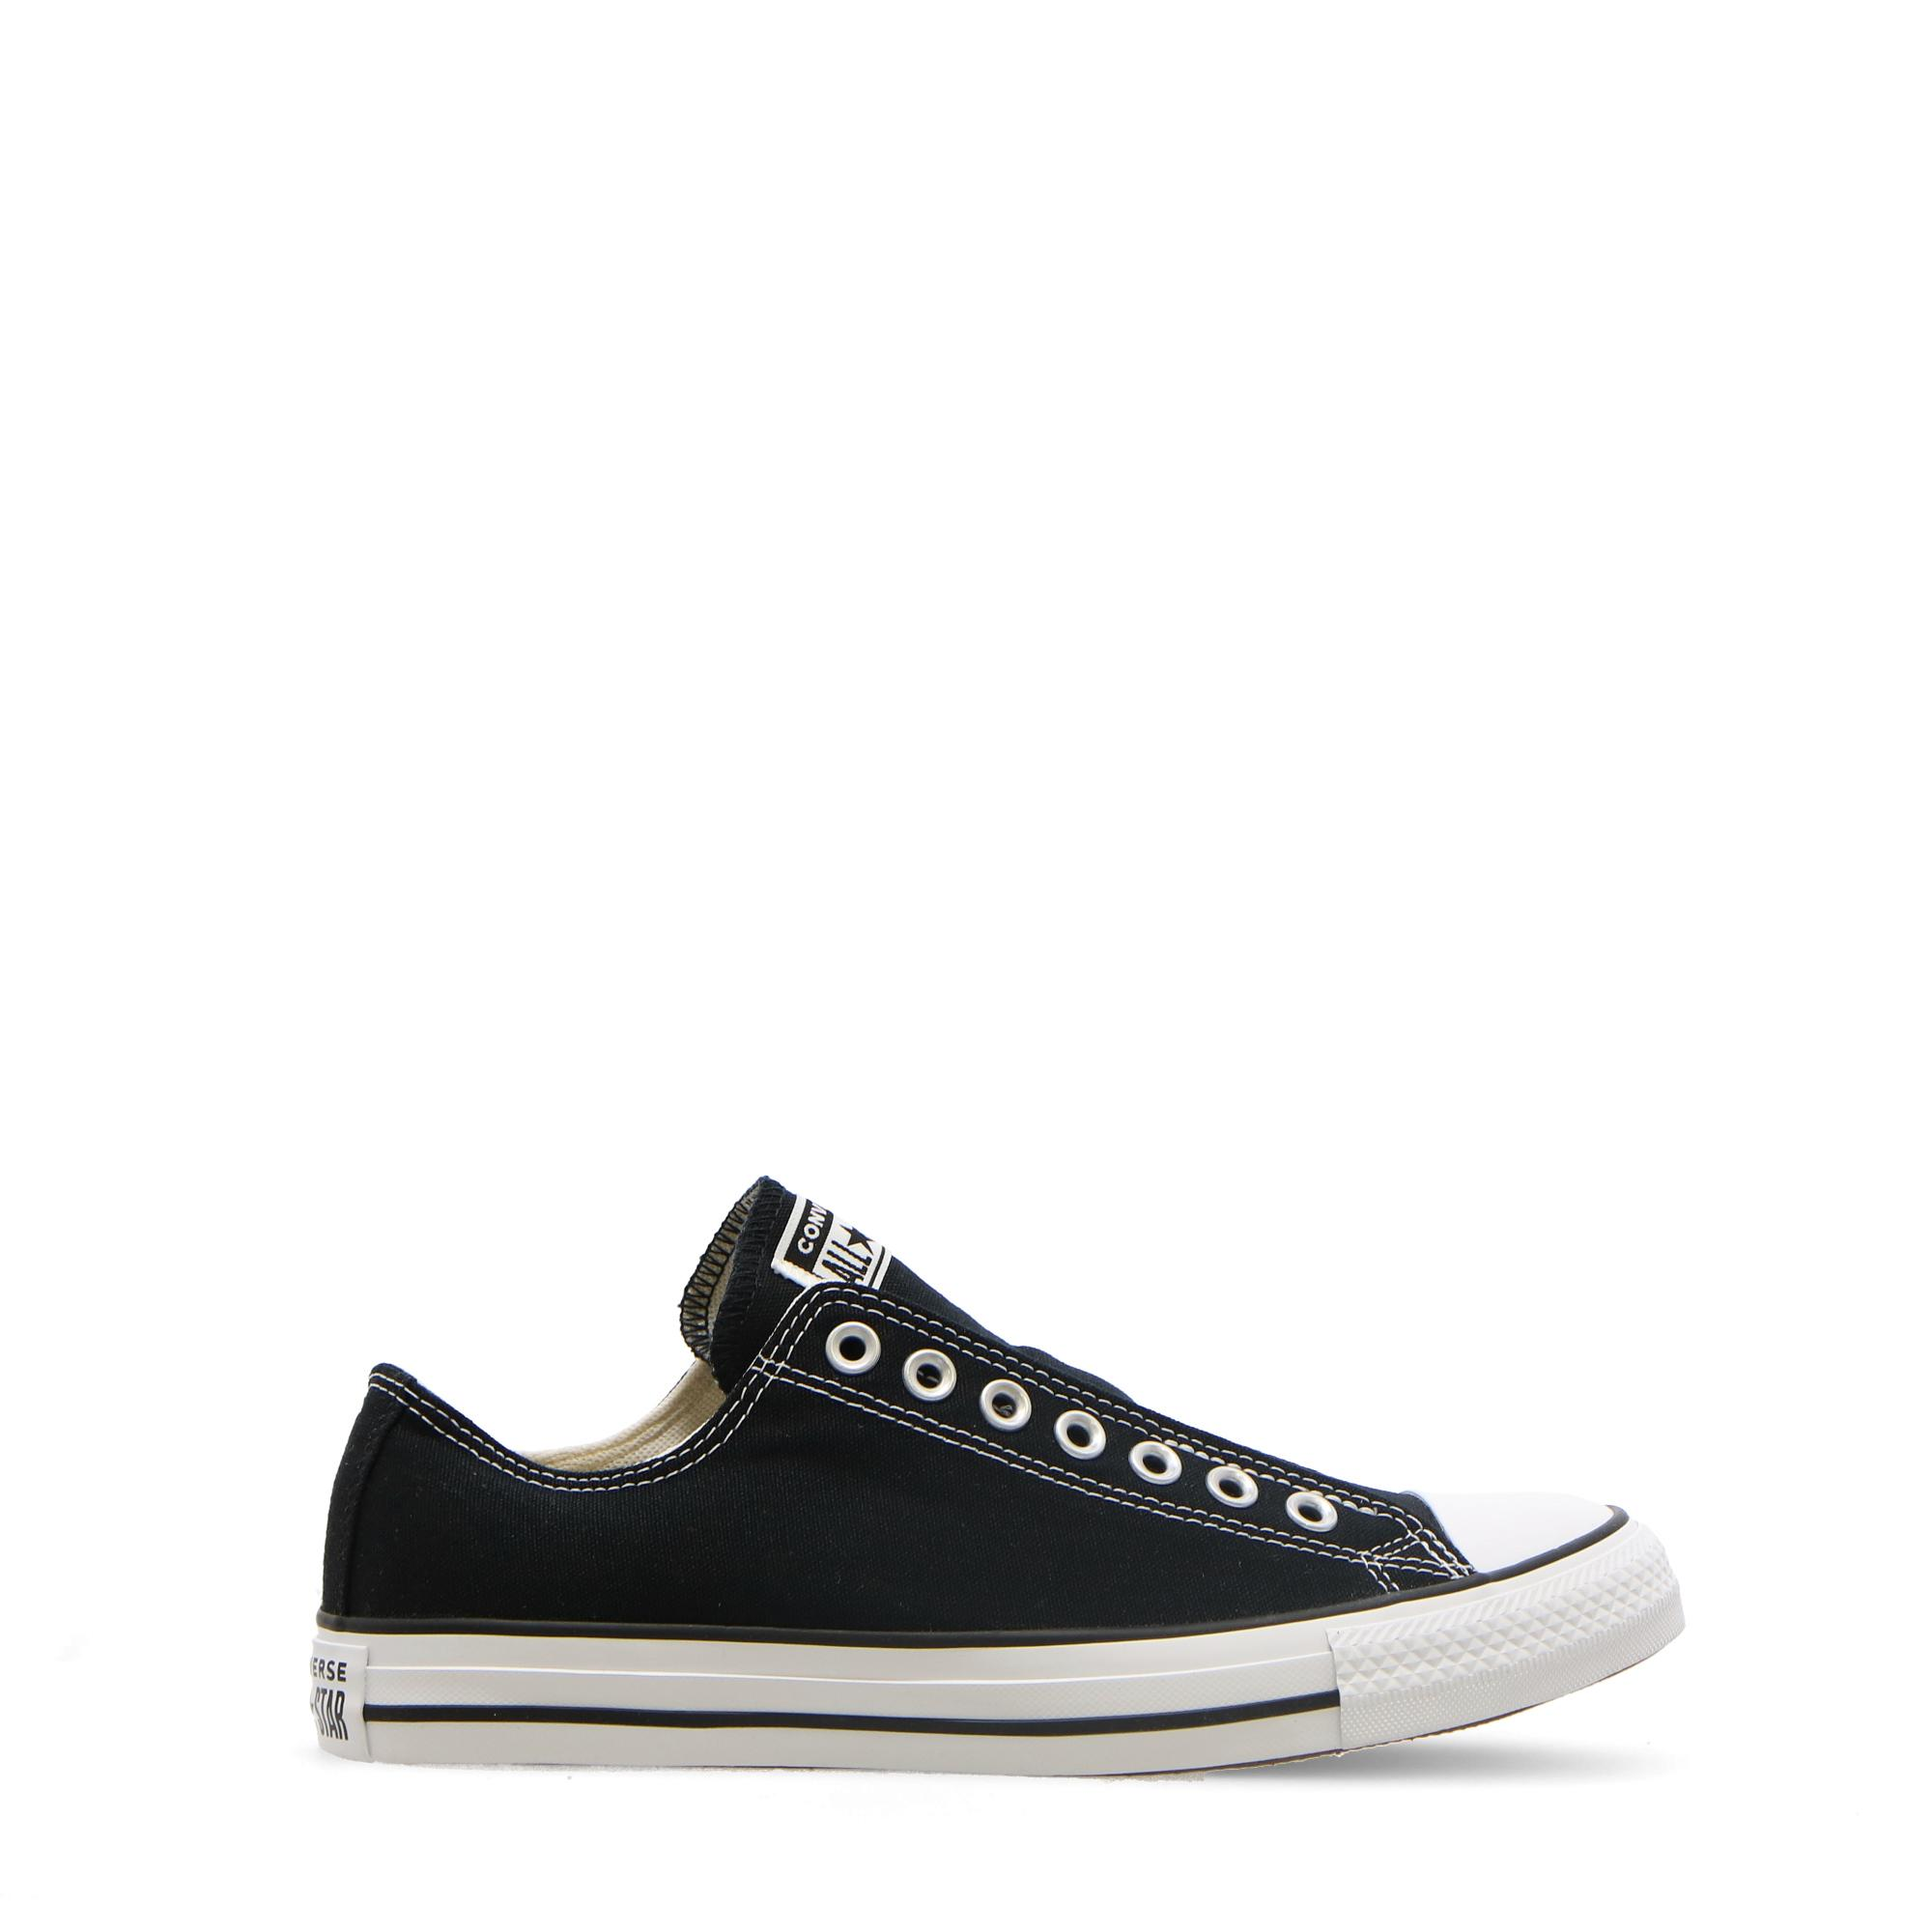 Converse Chuck Taylor All Star Slip Black white black